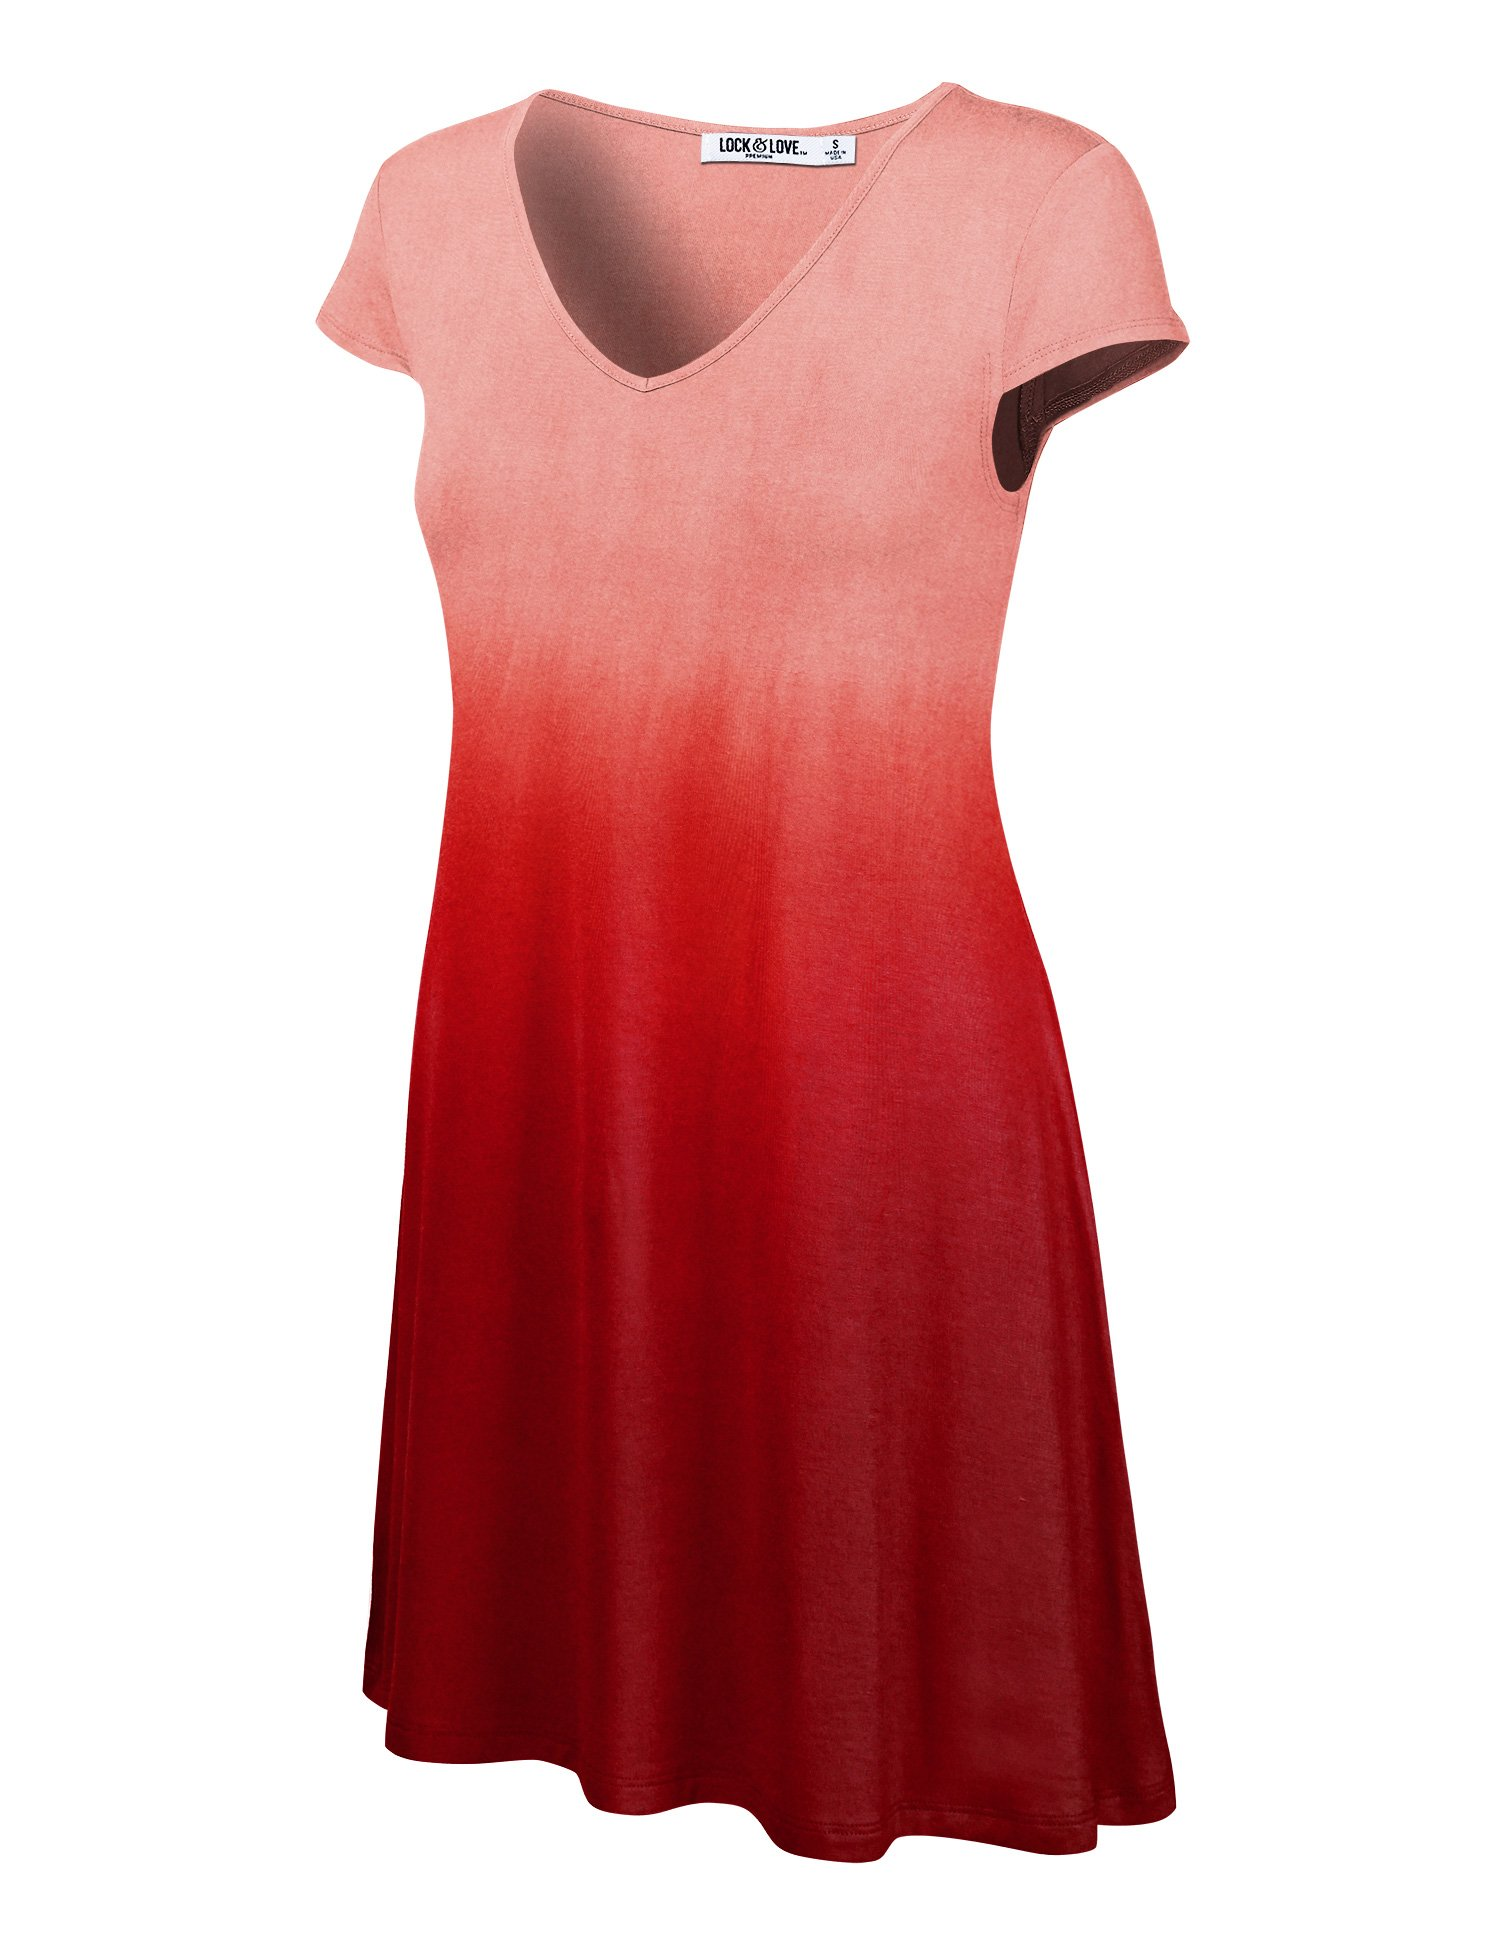 WDR1089 Womens Ombre V Neck Cap Sleeve T Shirt Dress XXXL Wine